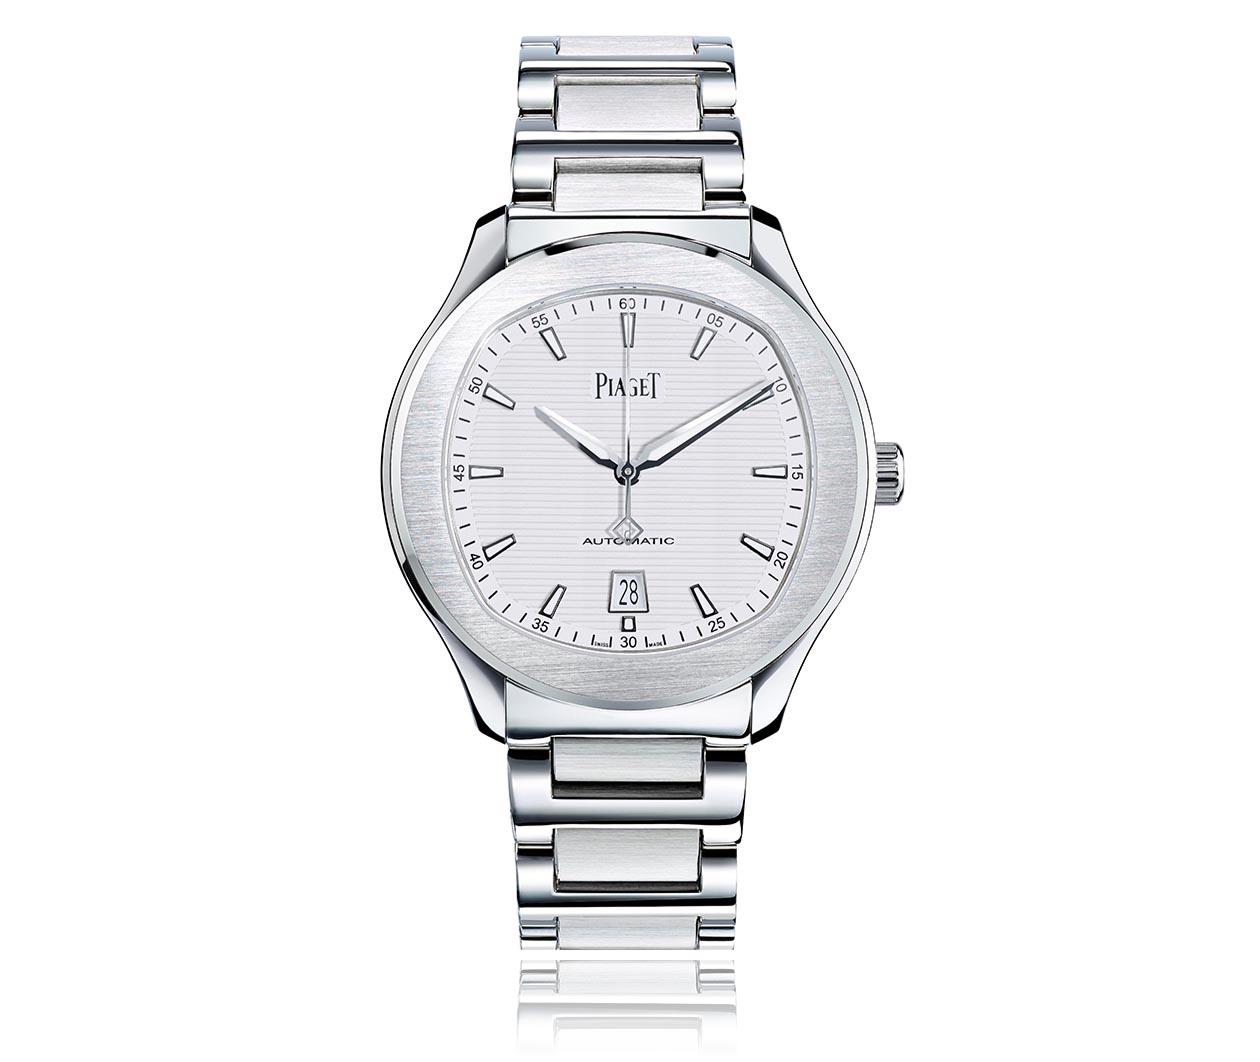 Piaget PoloS watch G0A41001 Carousel 1 FINAL